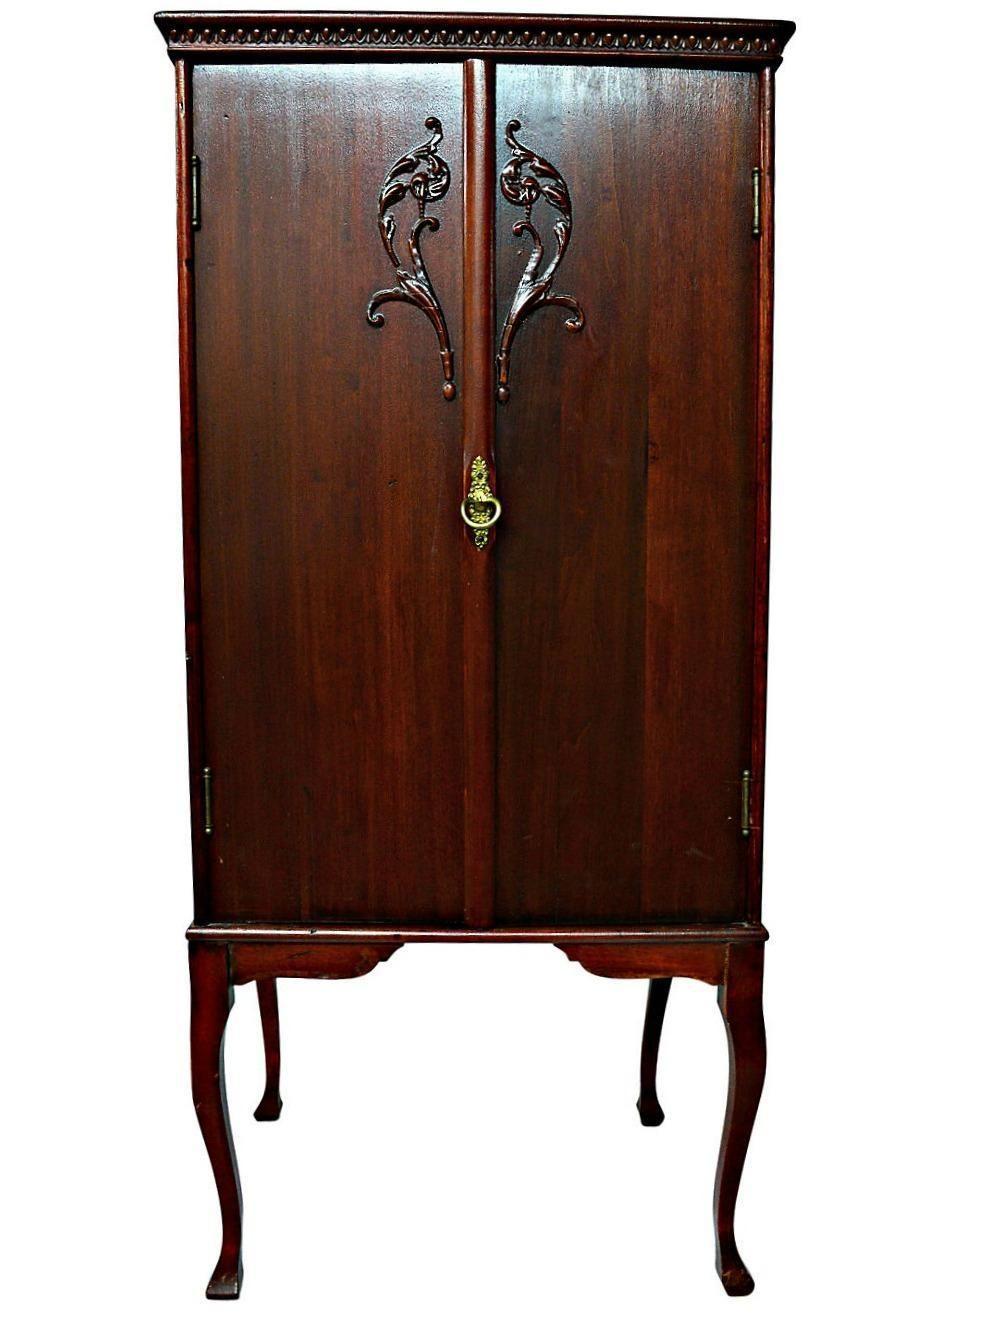 Antique Sheet Music Cabinet Antique Cabinets Sheet Music Storage Cabinet Cupboard